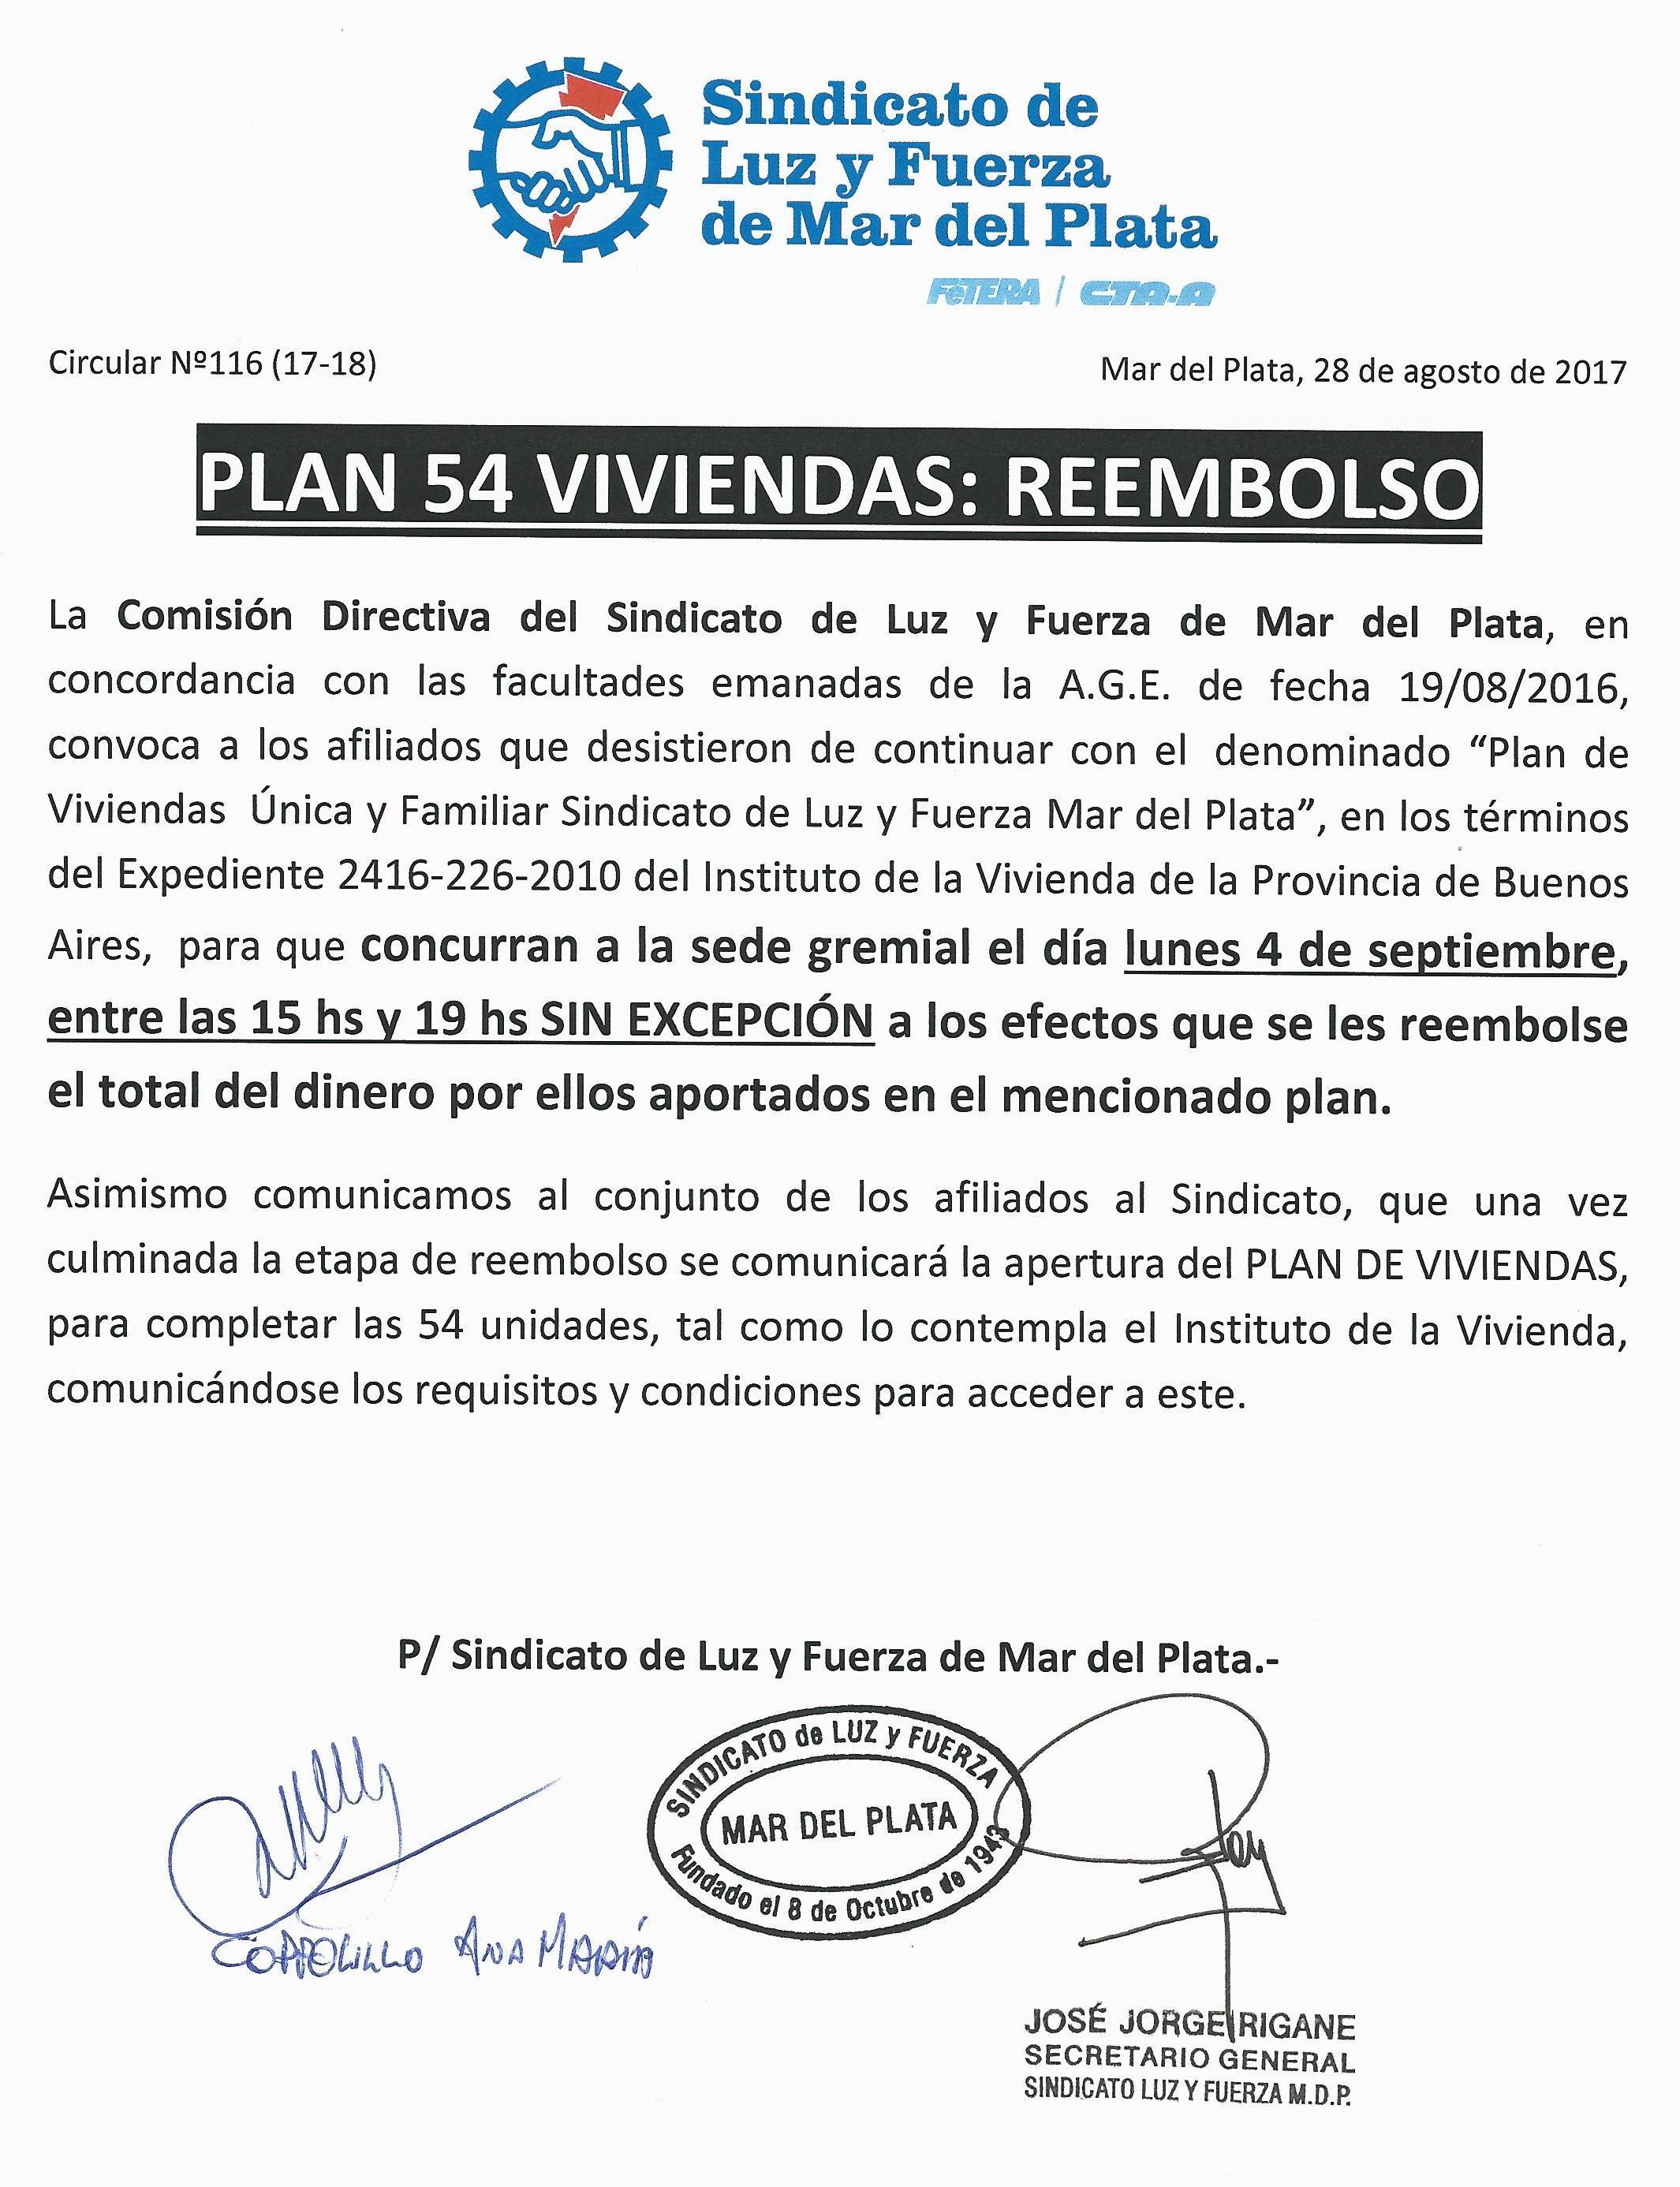 REEMBOLSO DE DINERO PLAN DE VIVIENDAS MAR DEL PLATA